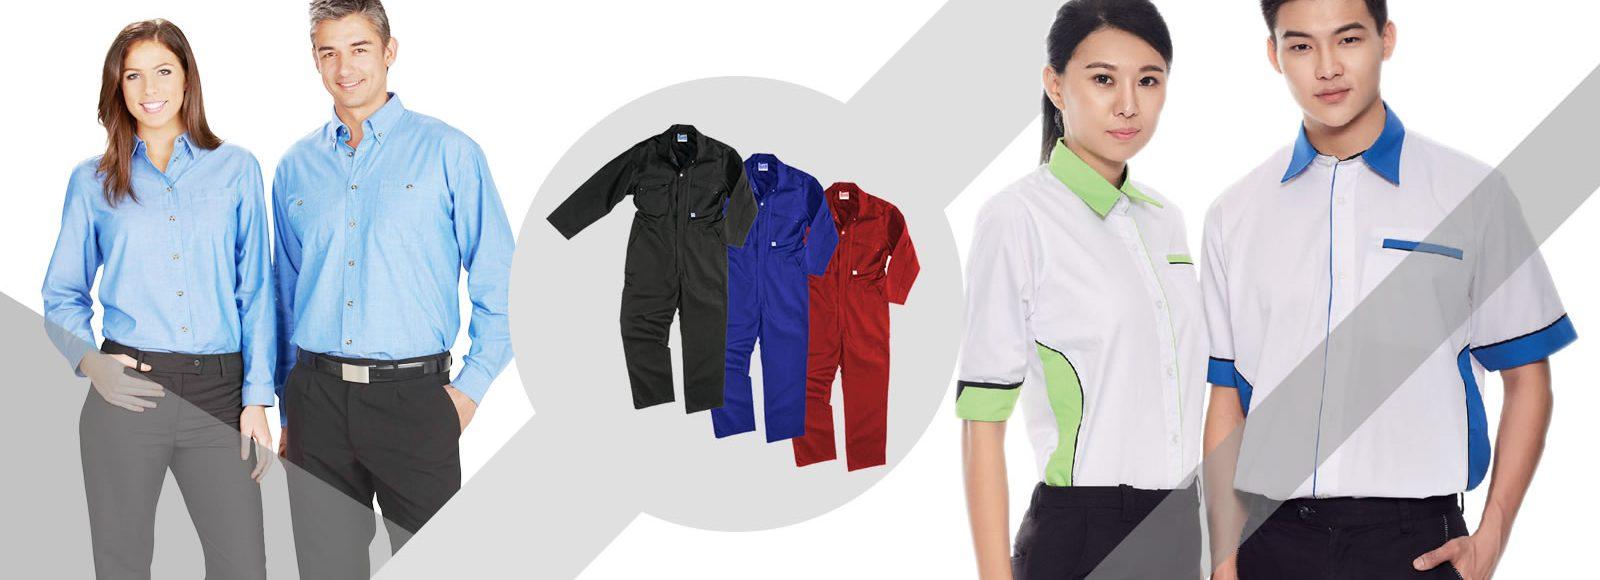 industrial-uniform